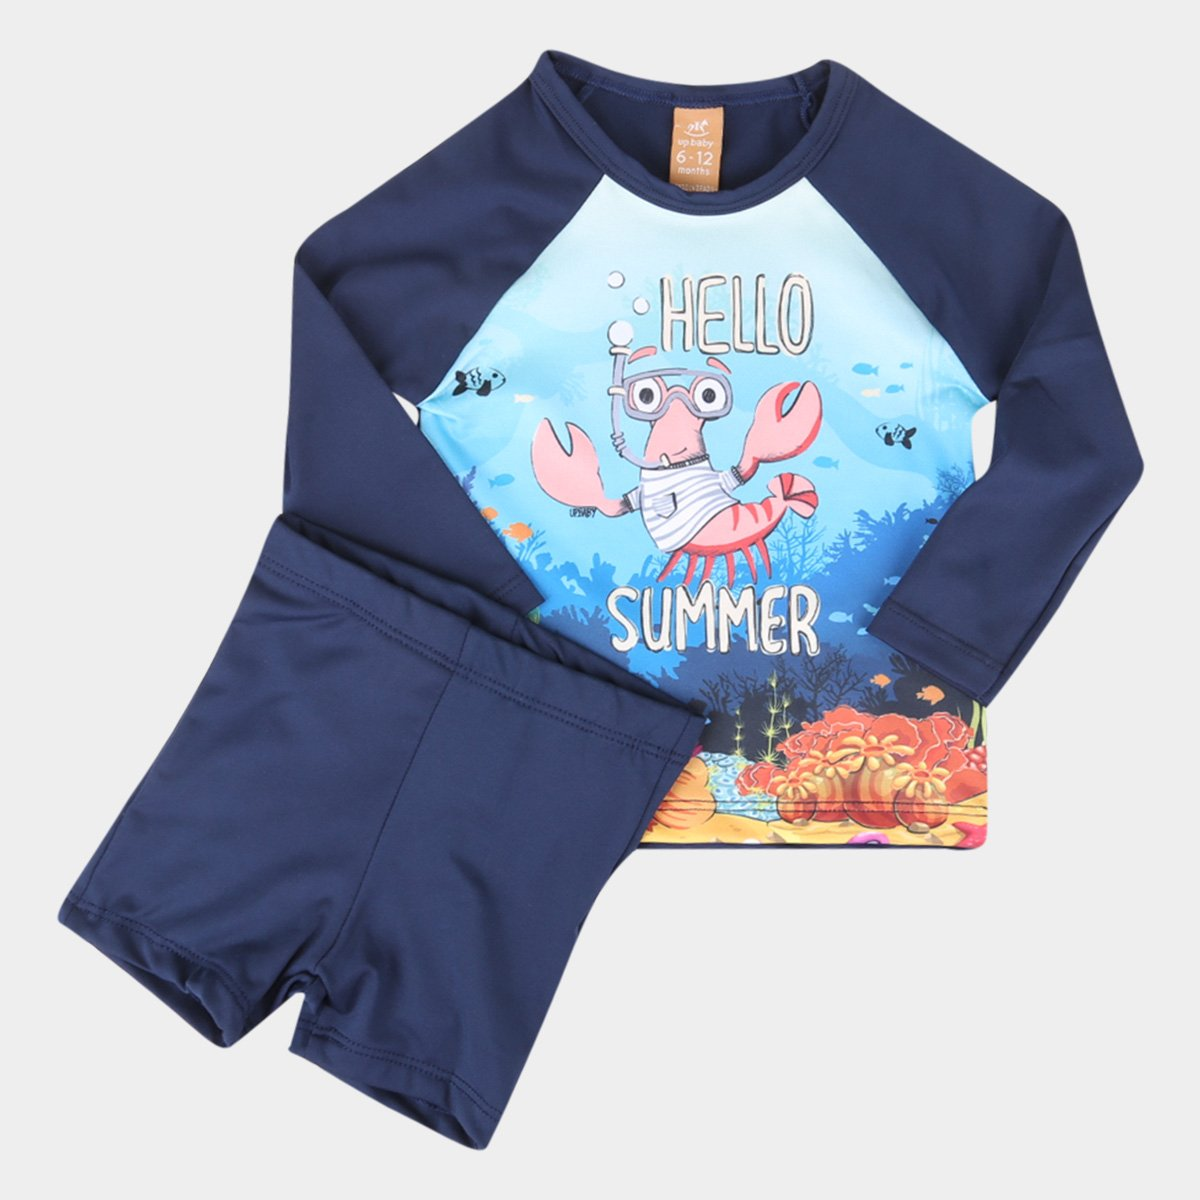 Conjunto Infantil Up Baby Manga Longa Proteção Uv Happy Summer Feminino